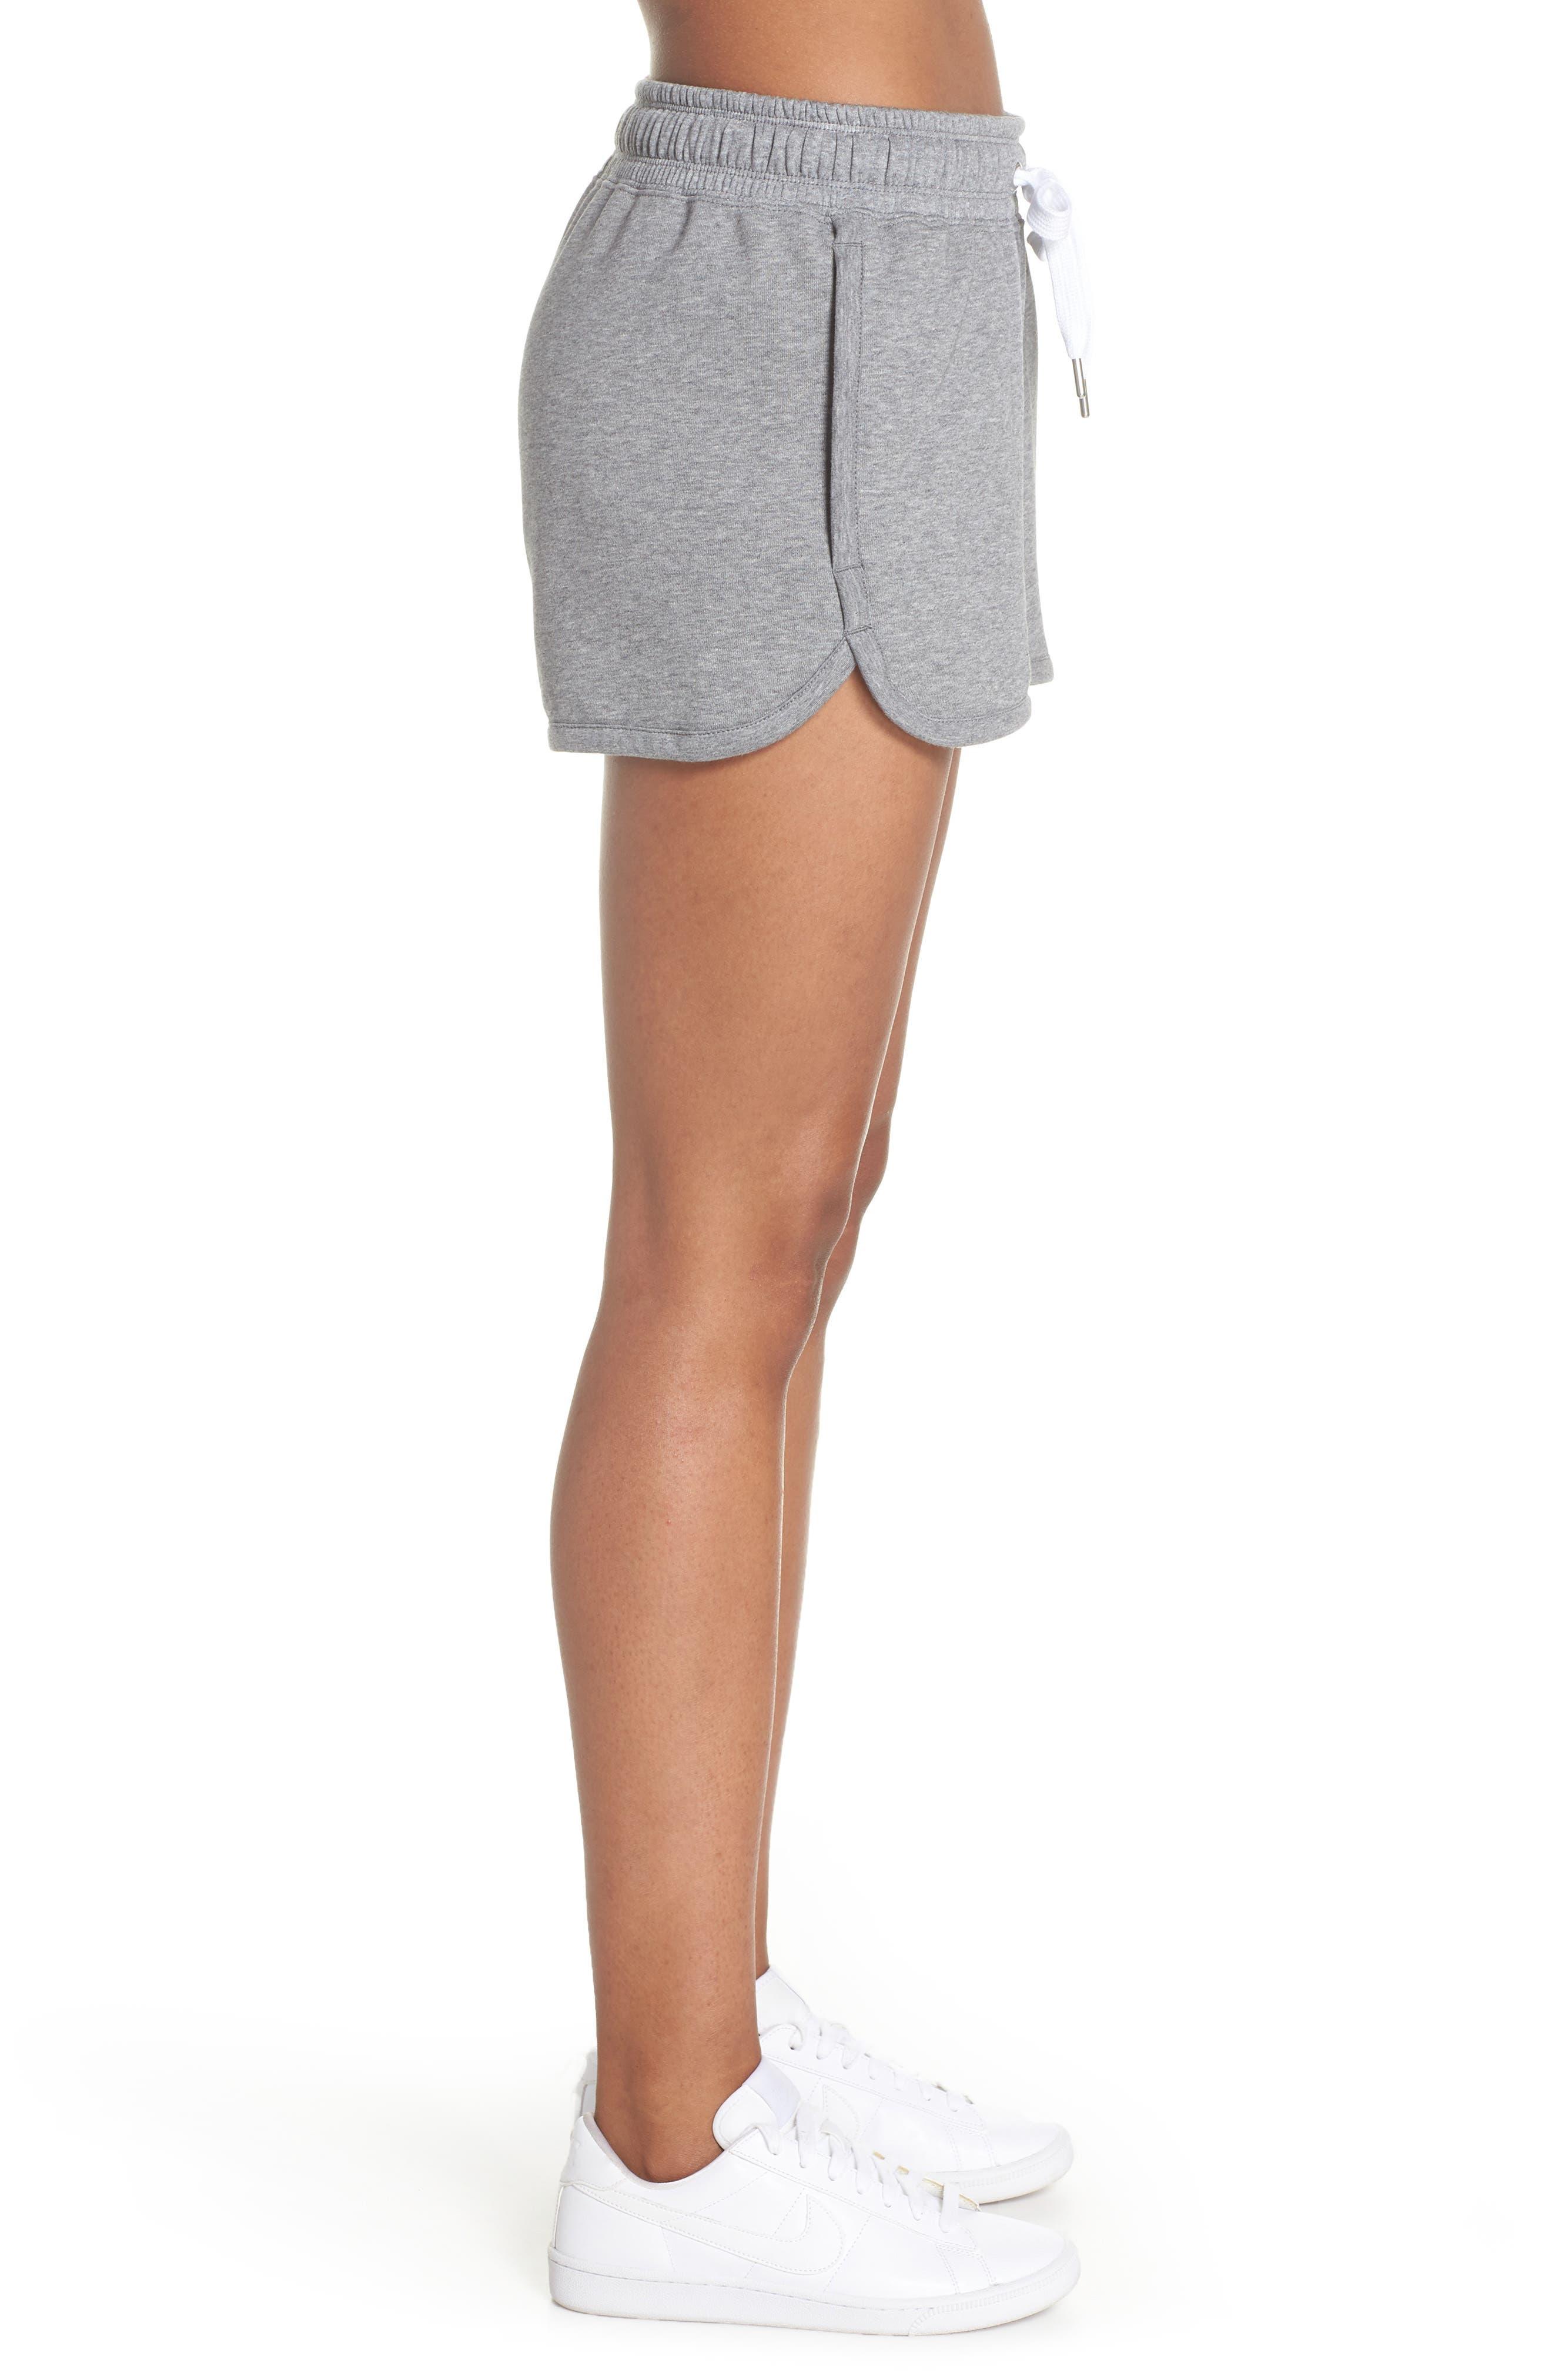 Sportswear Air Gym Shorts,                             Alternate thumbnail 3, color,